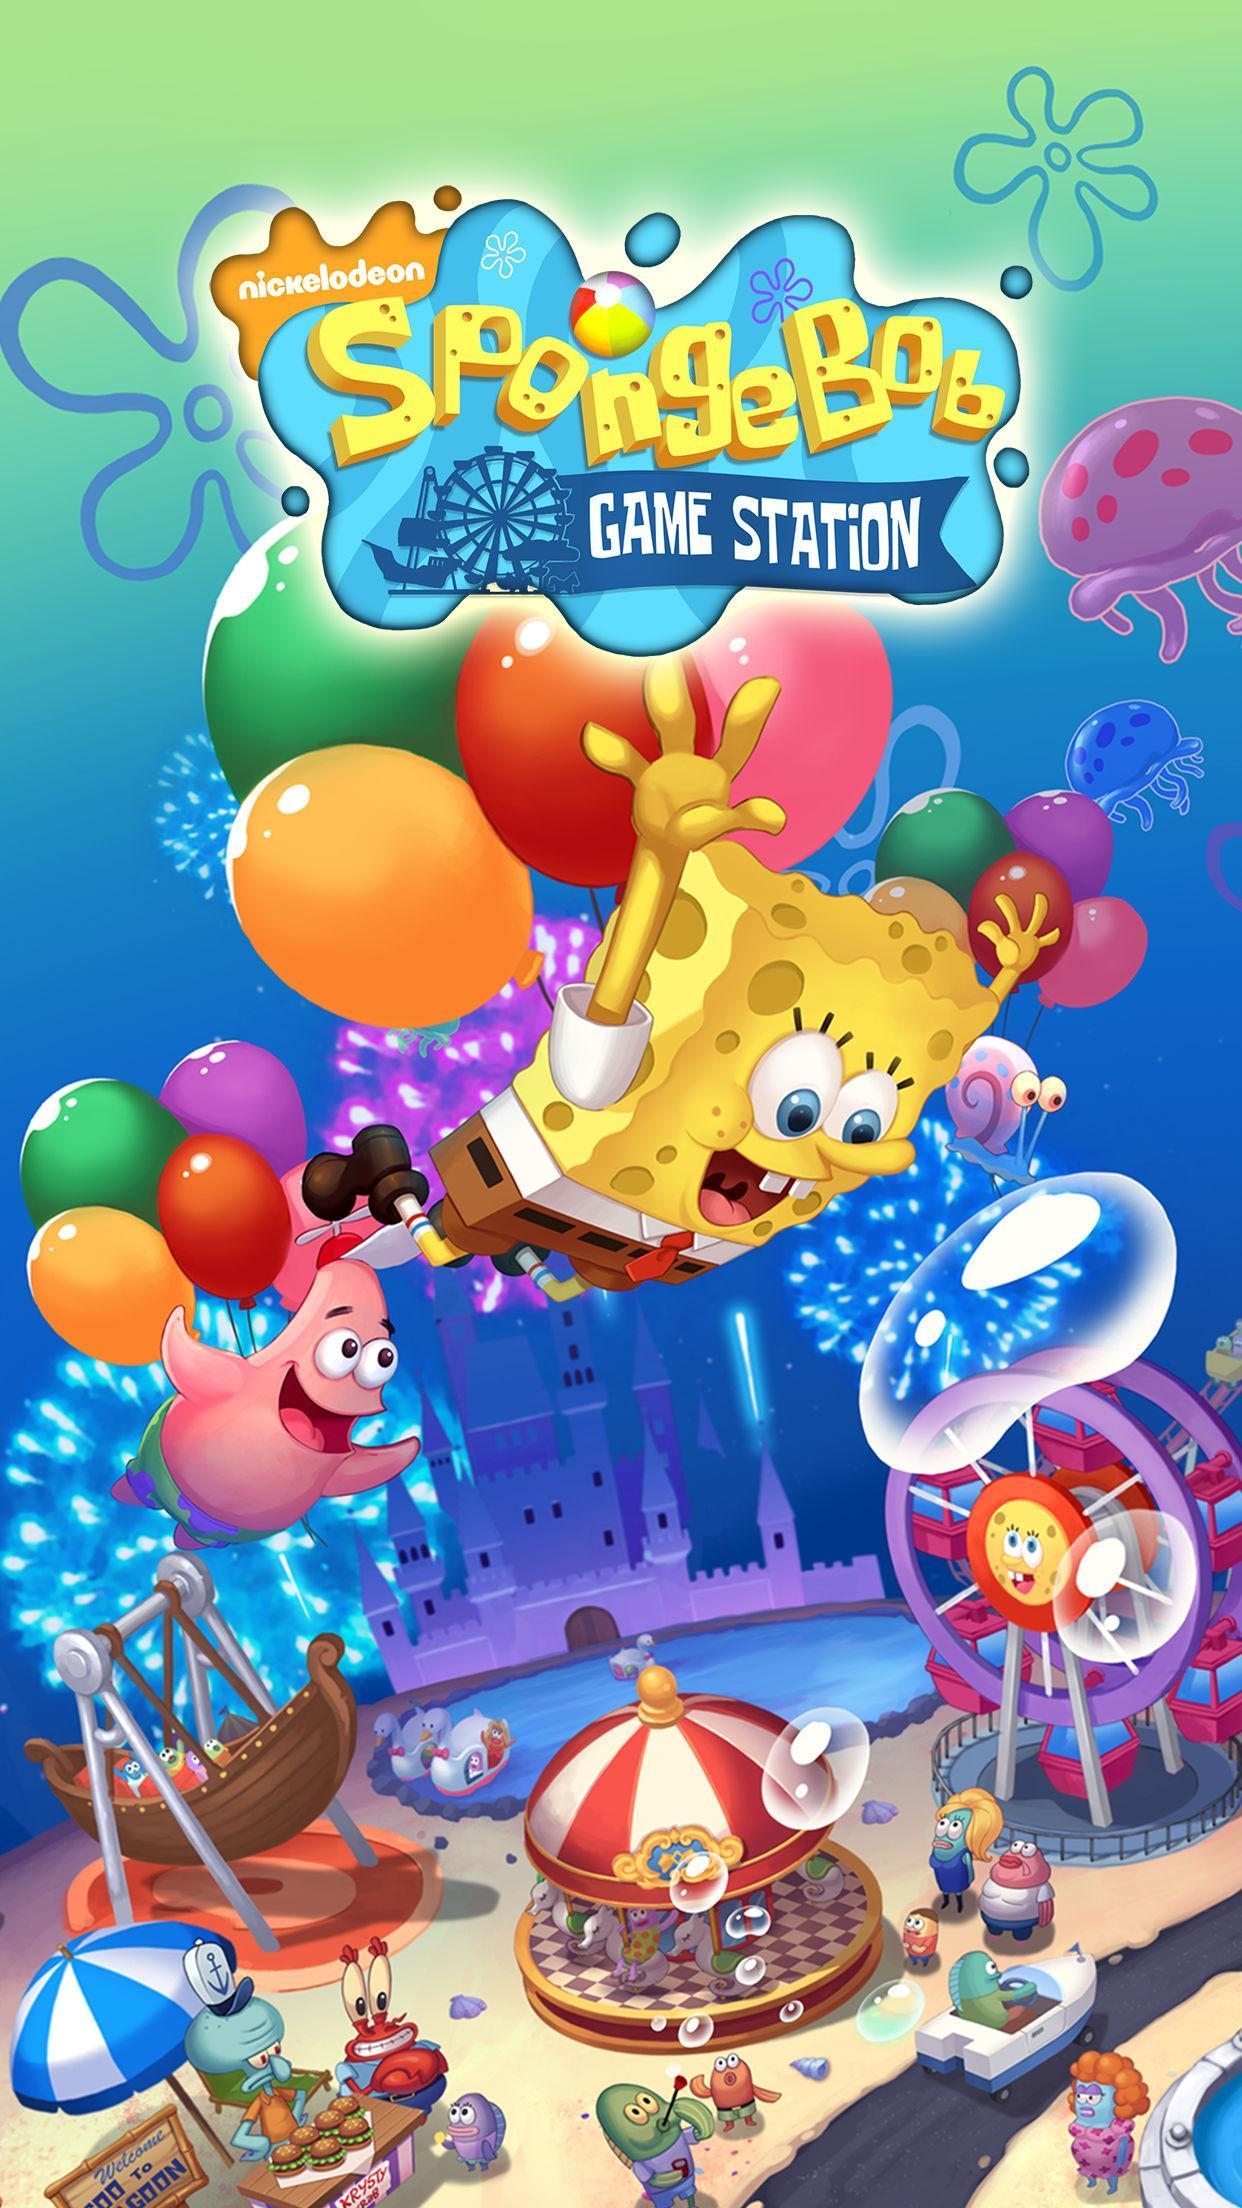 SpongeBob Game Station for Android - APK Download